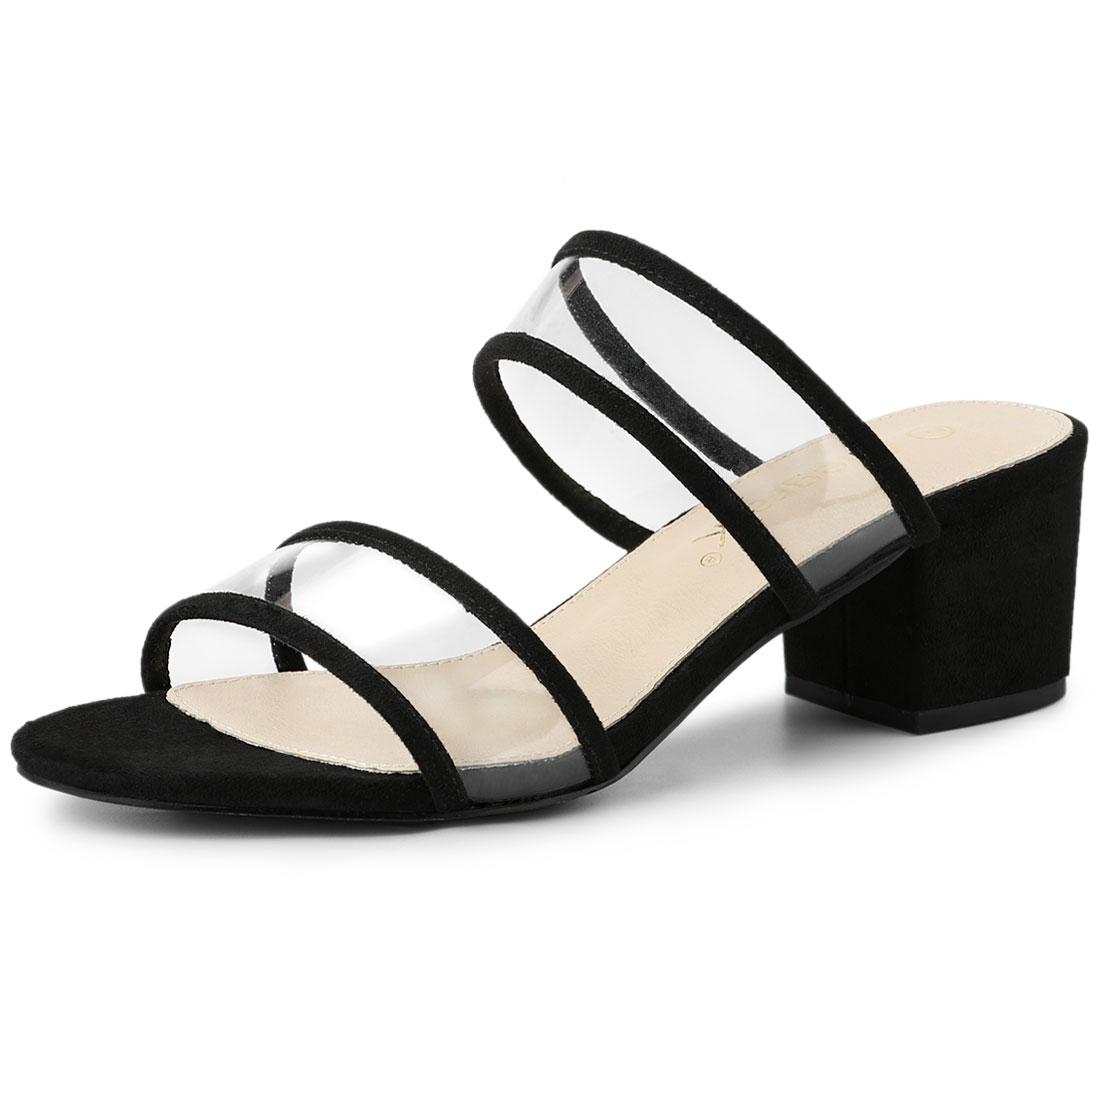 Allegra K Women's Clear Strap Block Heel Slide Sandals Black US 5.5